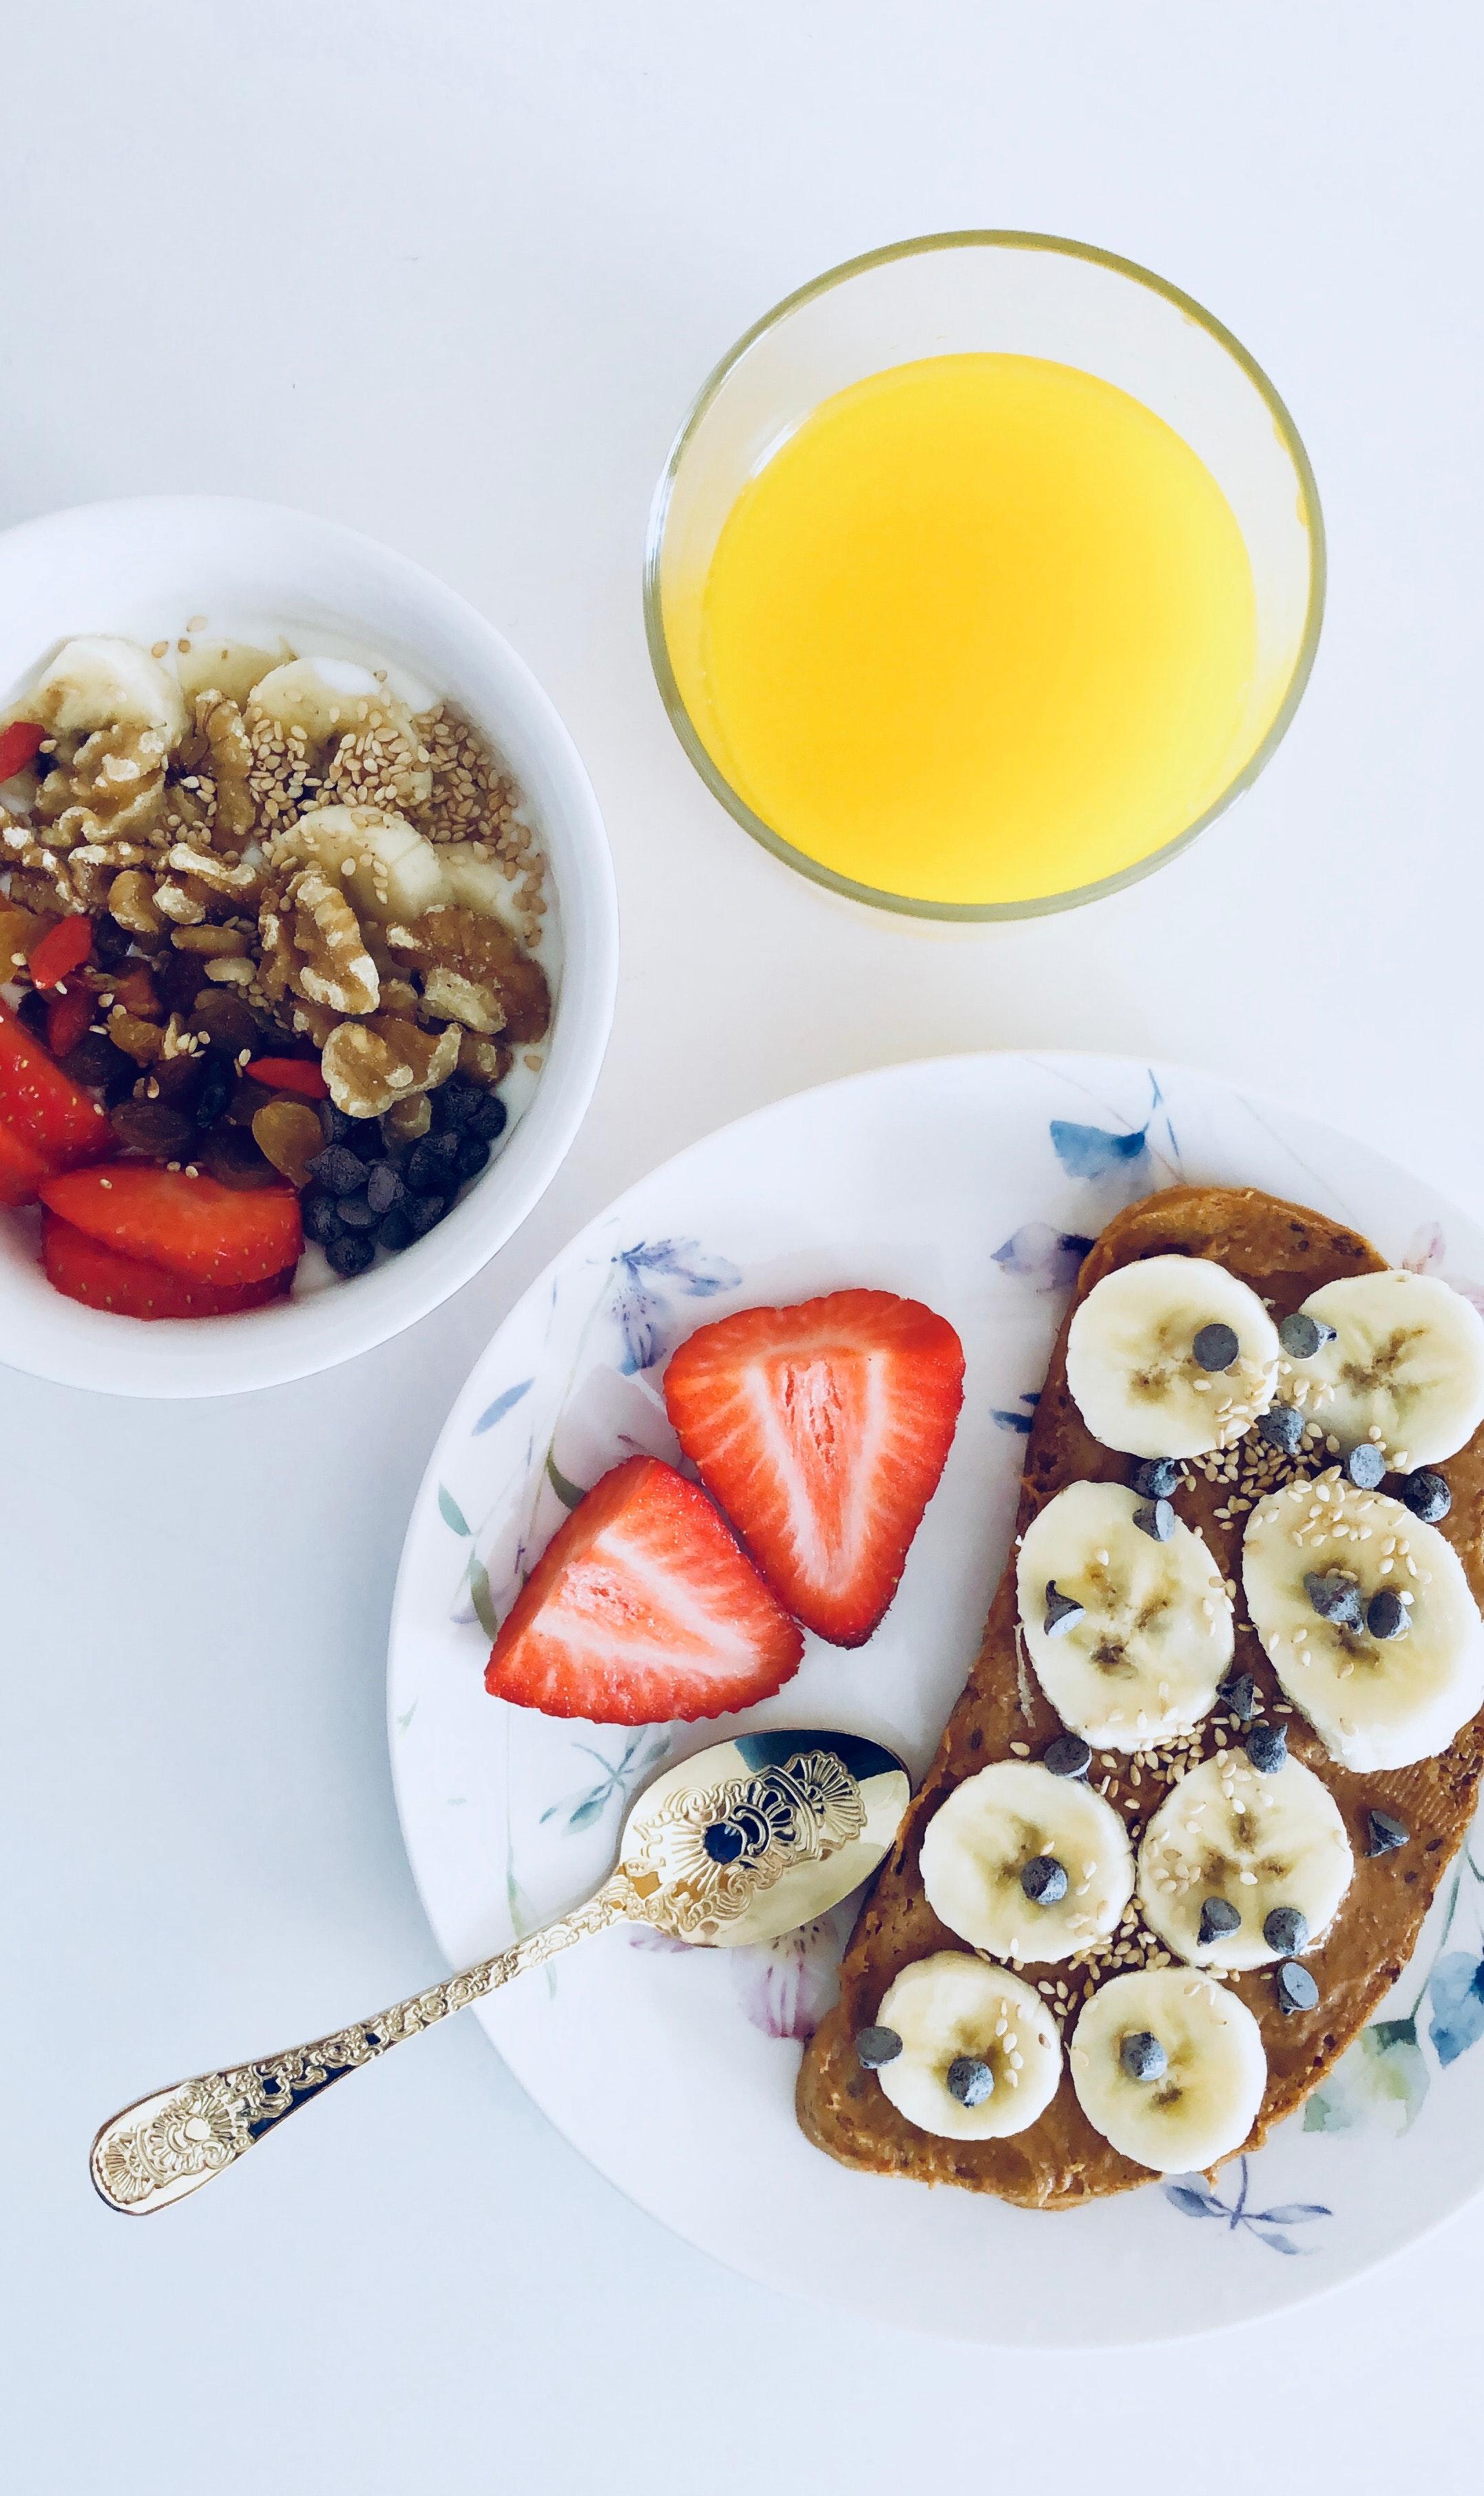 Flatlay Photography of Bread and Fruits, Banana, Healthy, Strawberries, Spoon, HQ Photo